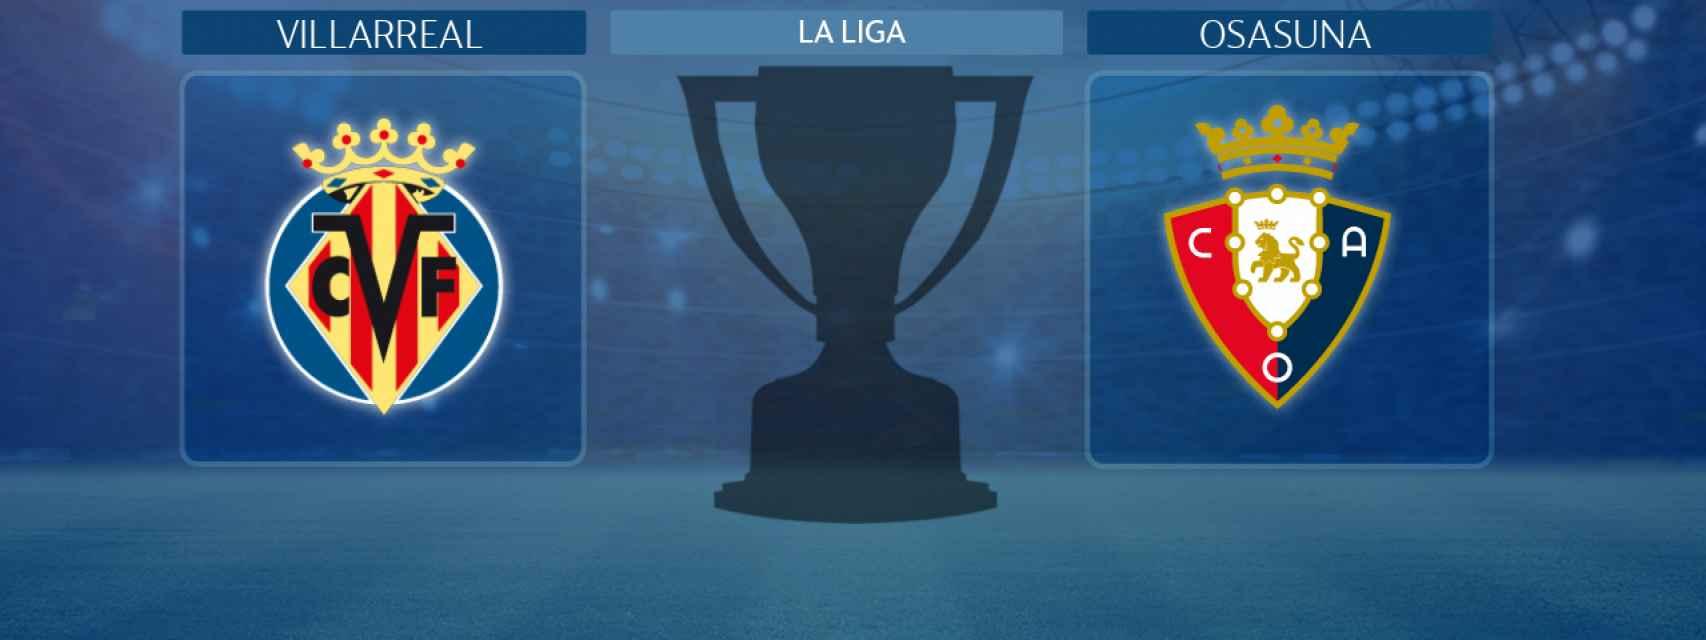 Villarreal - Osasuna, partido de La Liga